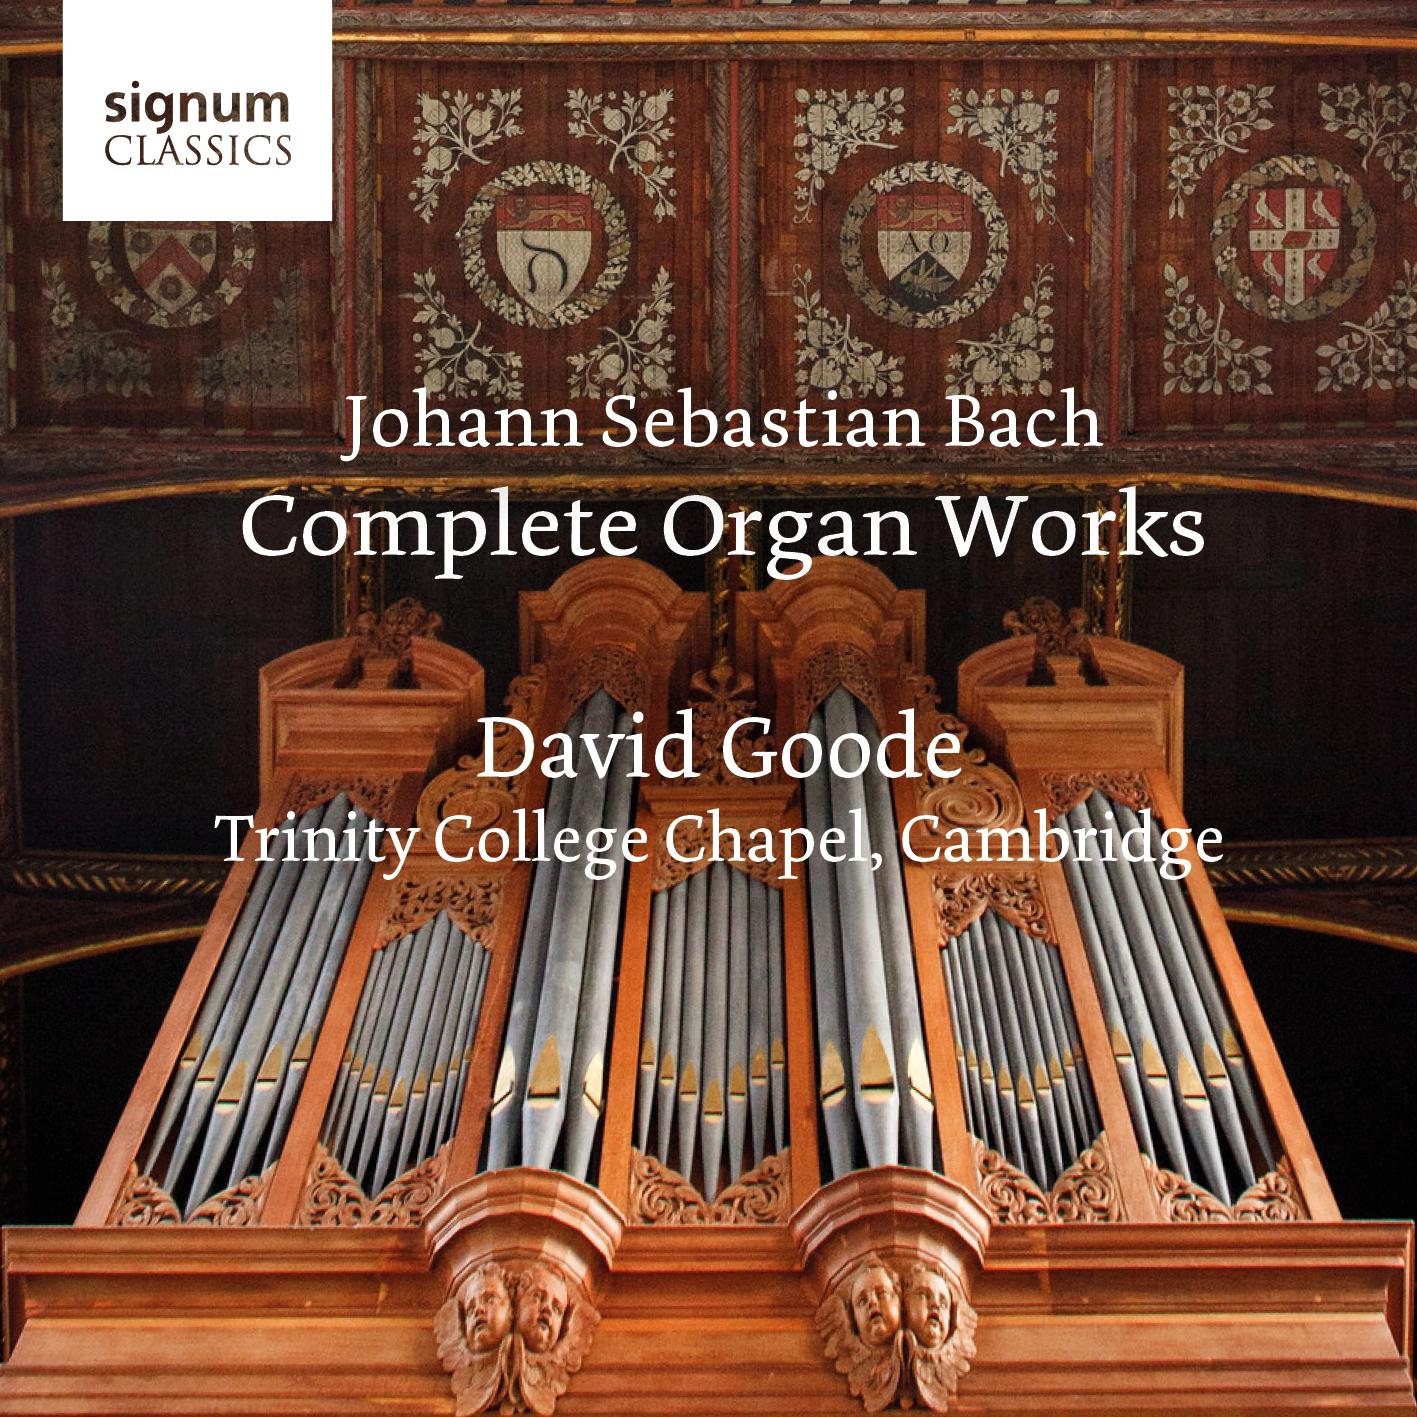 Johann Sebastian Bach Complete Organ Works - David Goode, Trinity College Chapel, Cambridge